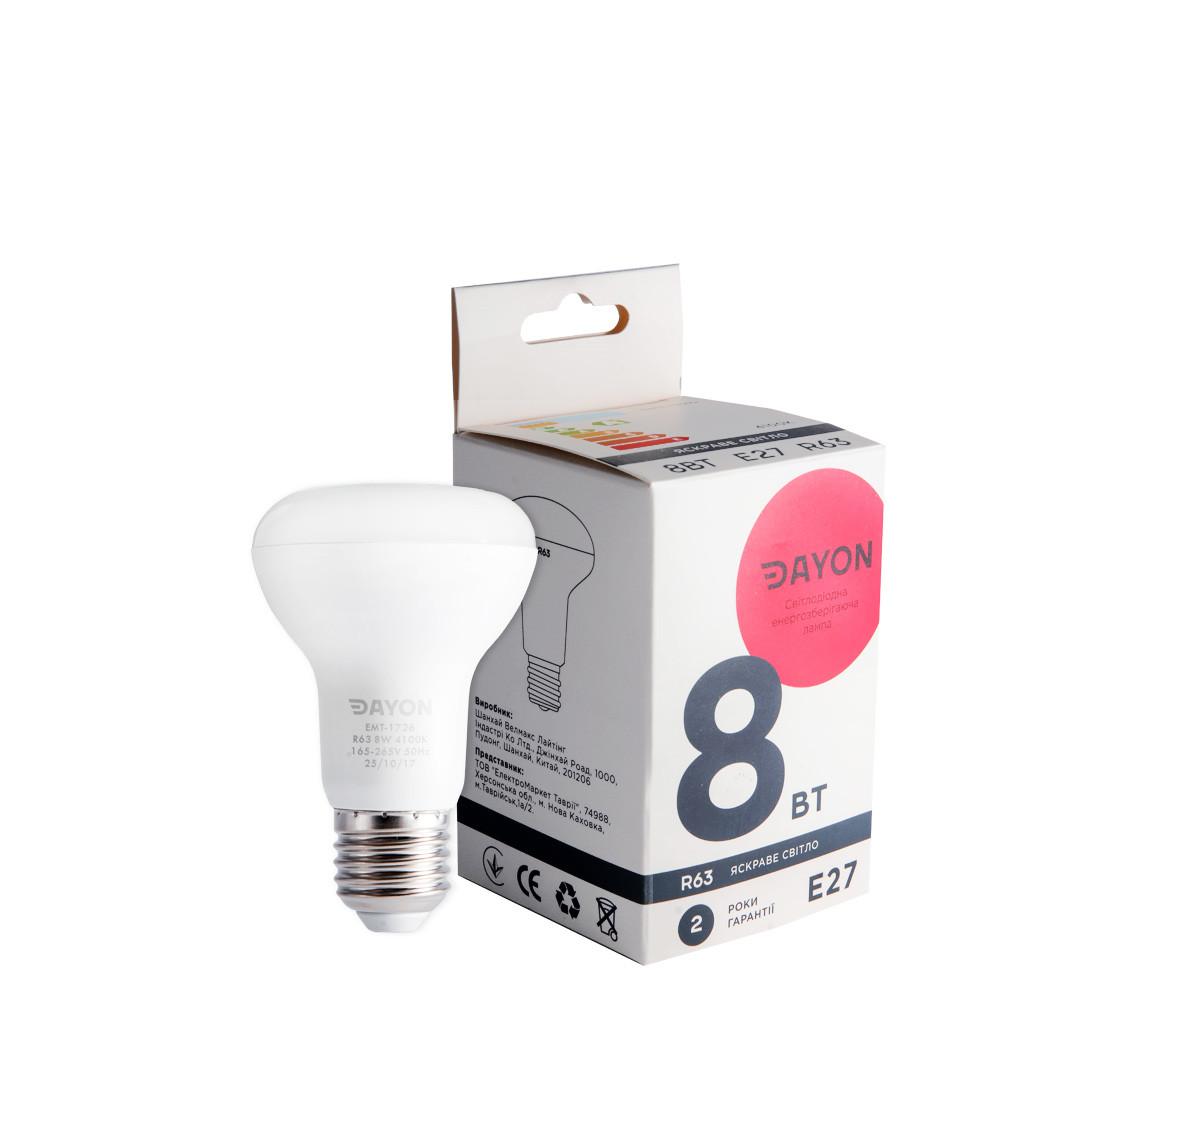 Светодиодная лампа DAYON EMT-1726 R63 8W 4100K E27